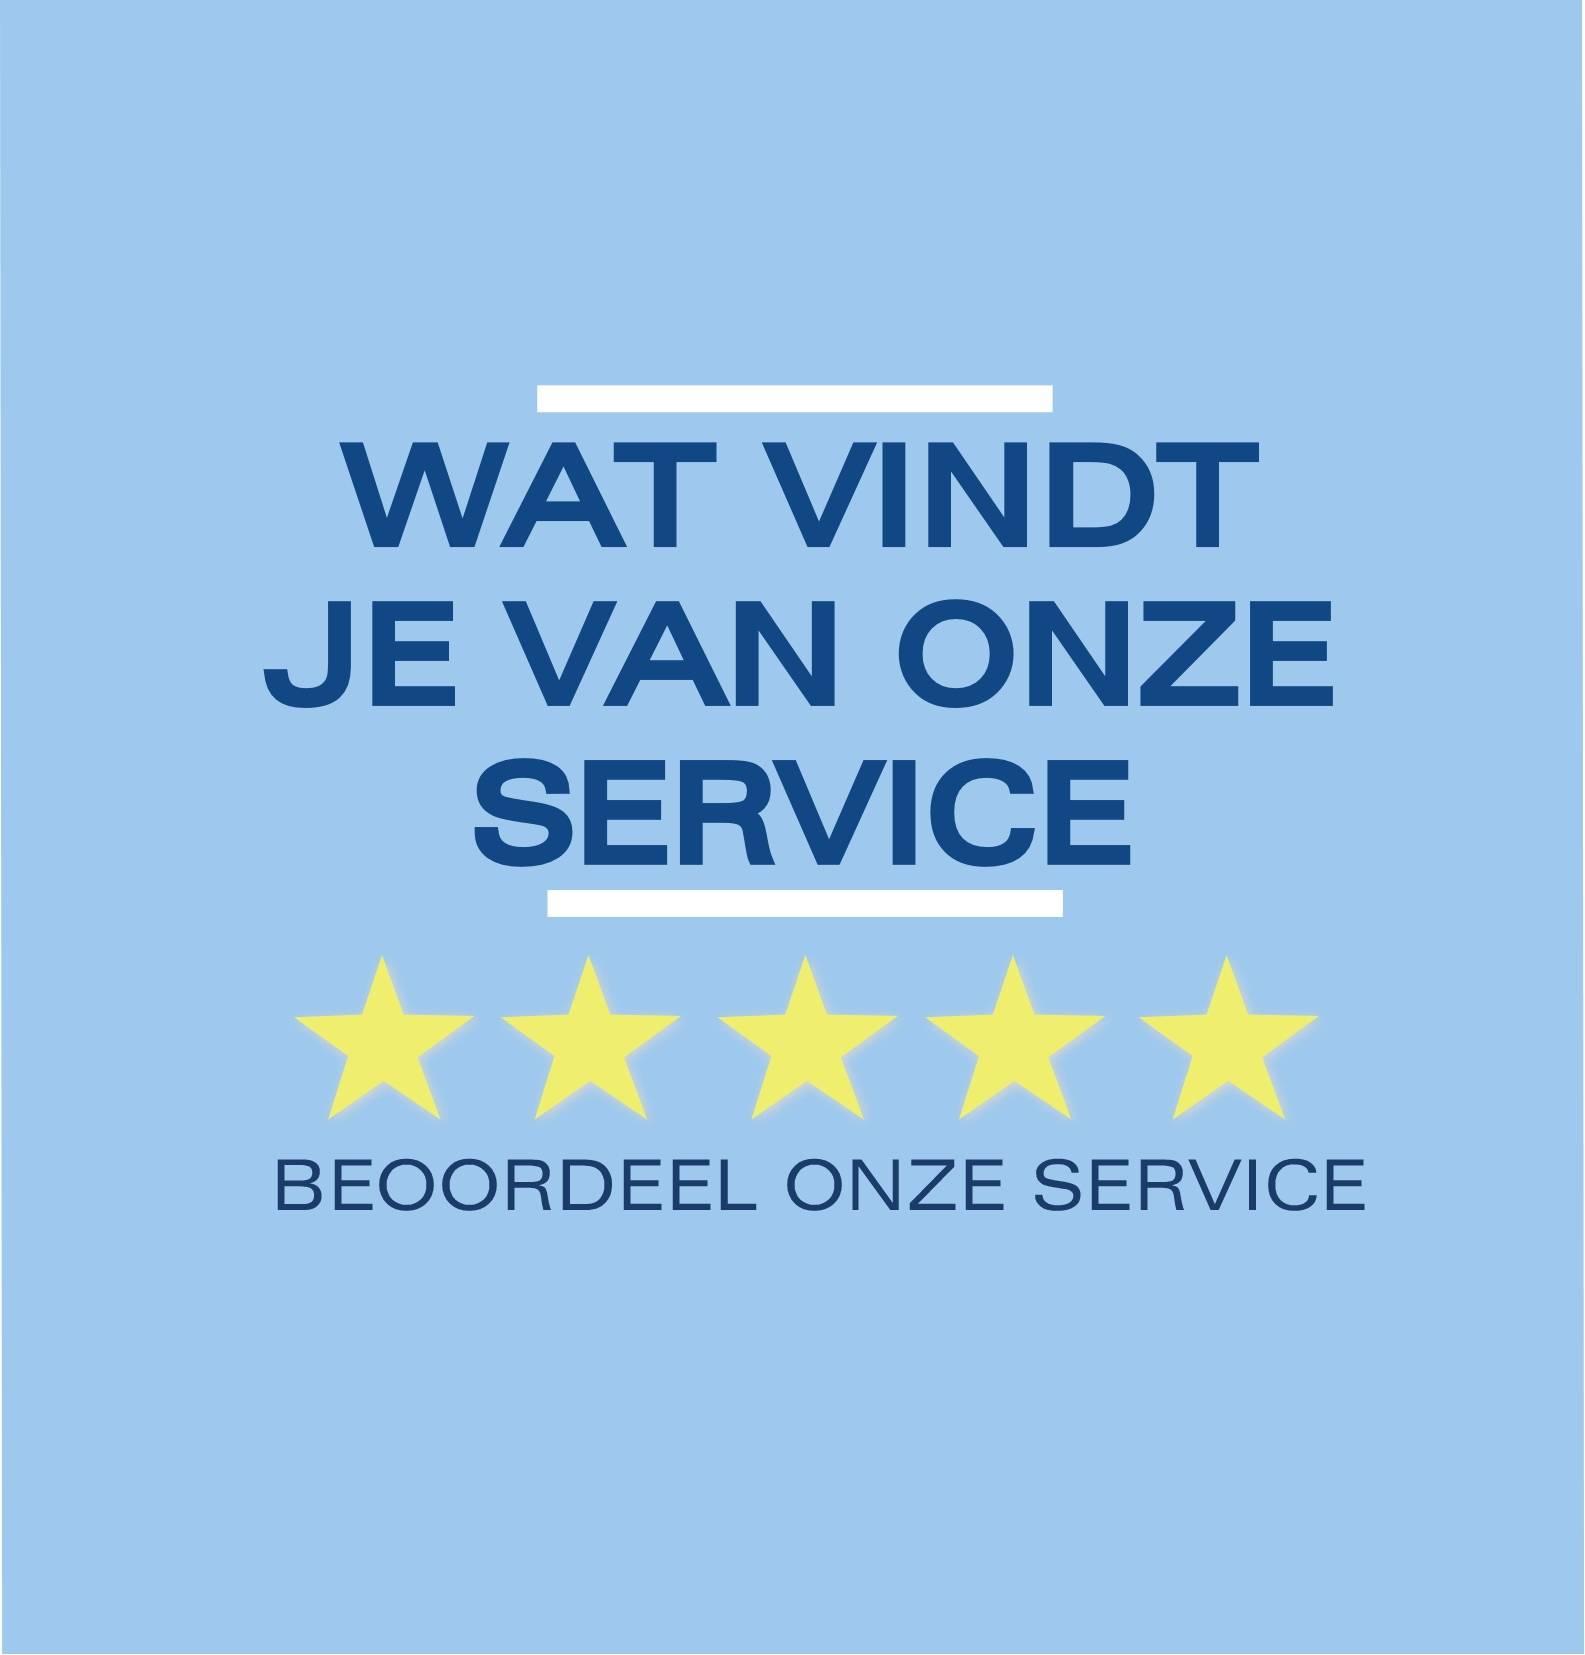 Ducotex_onze service